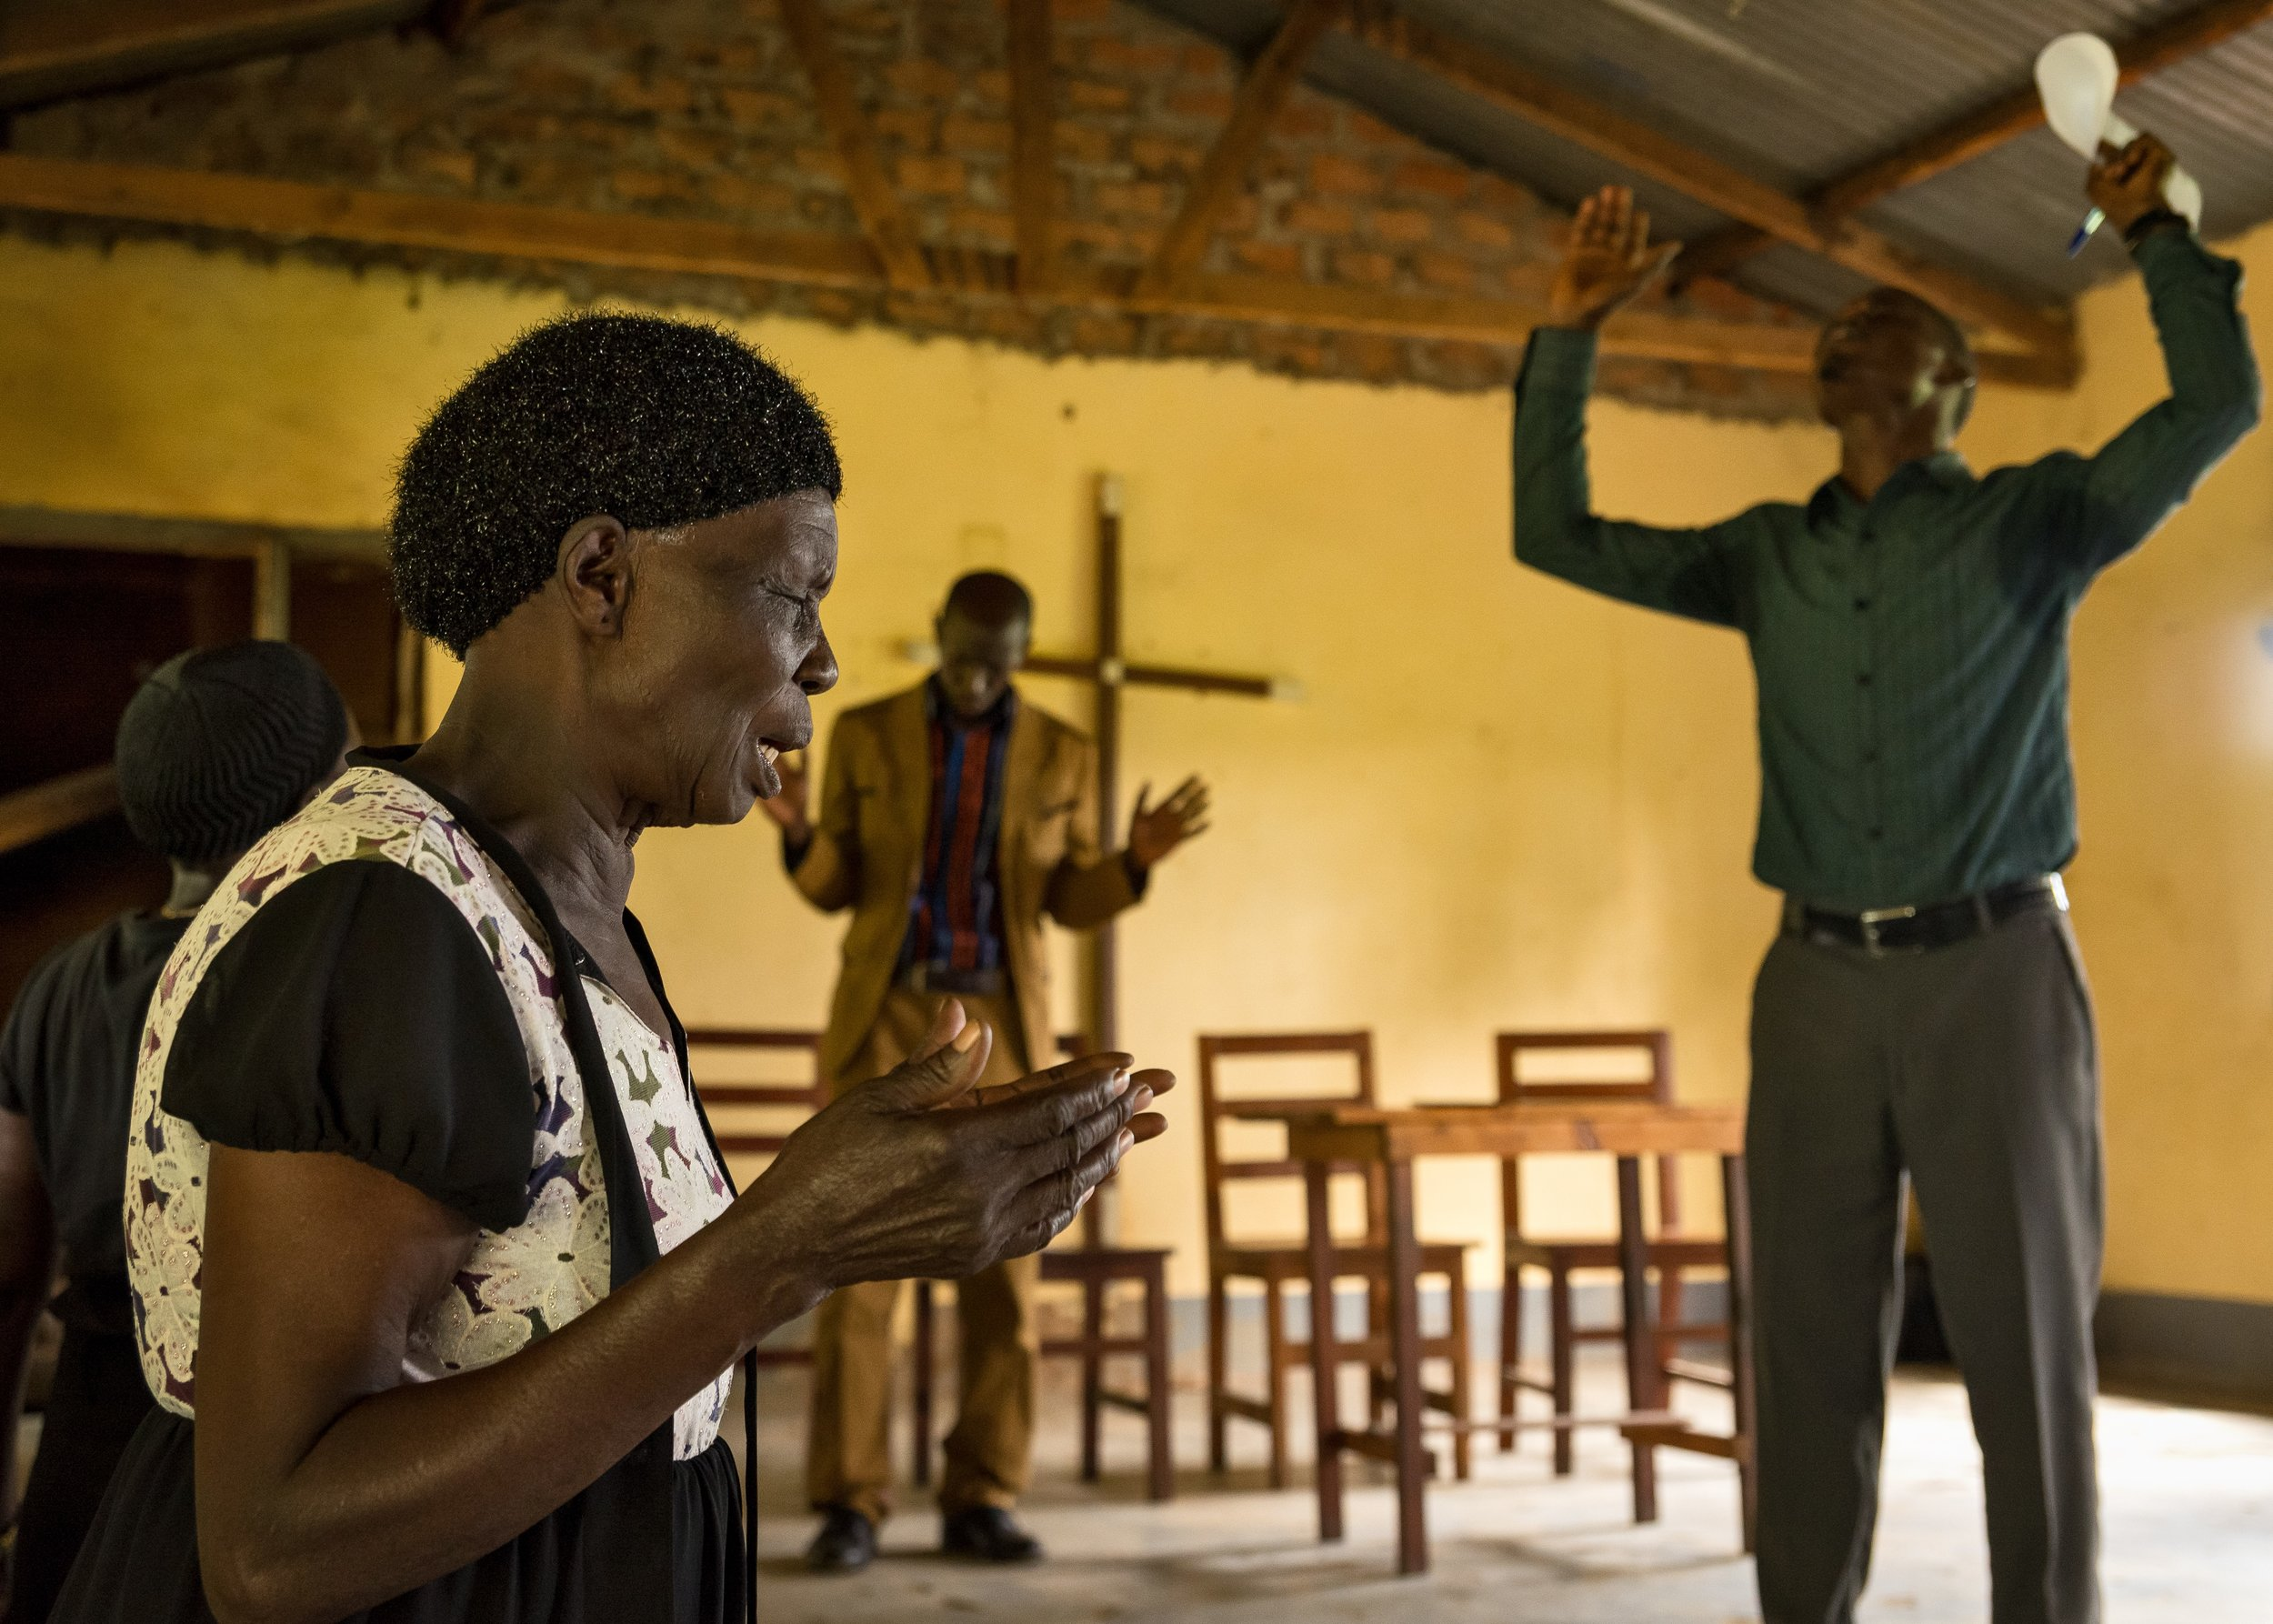 church-singing-praise